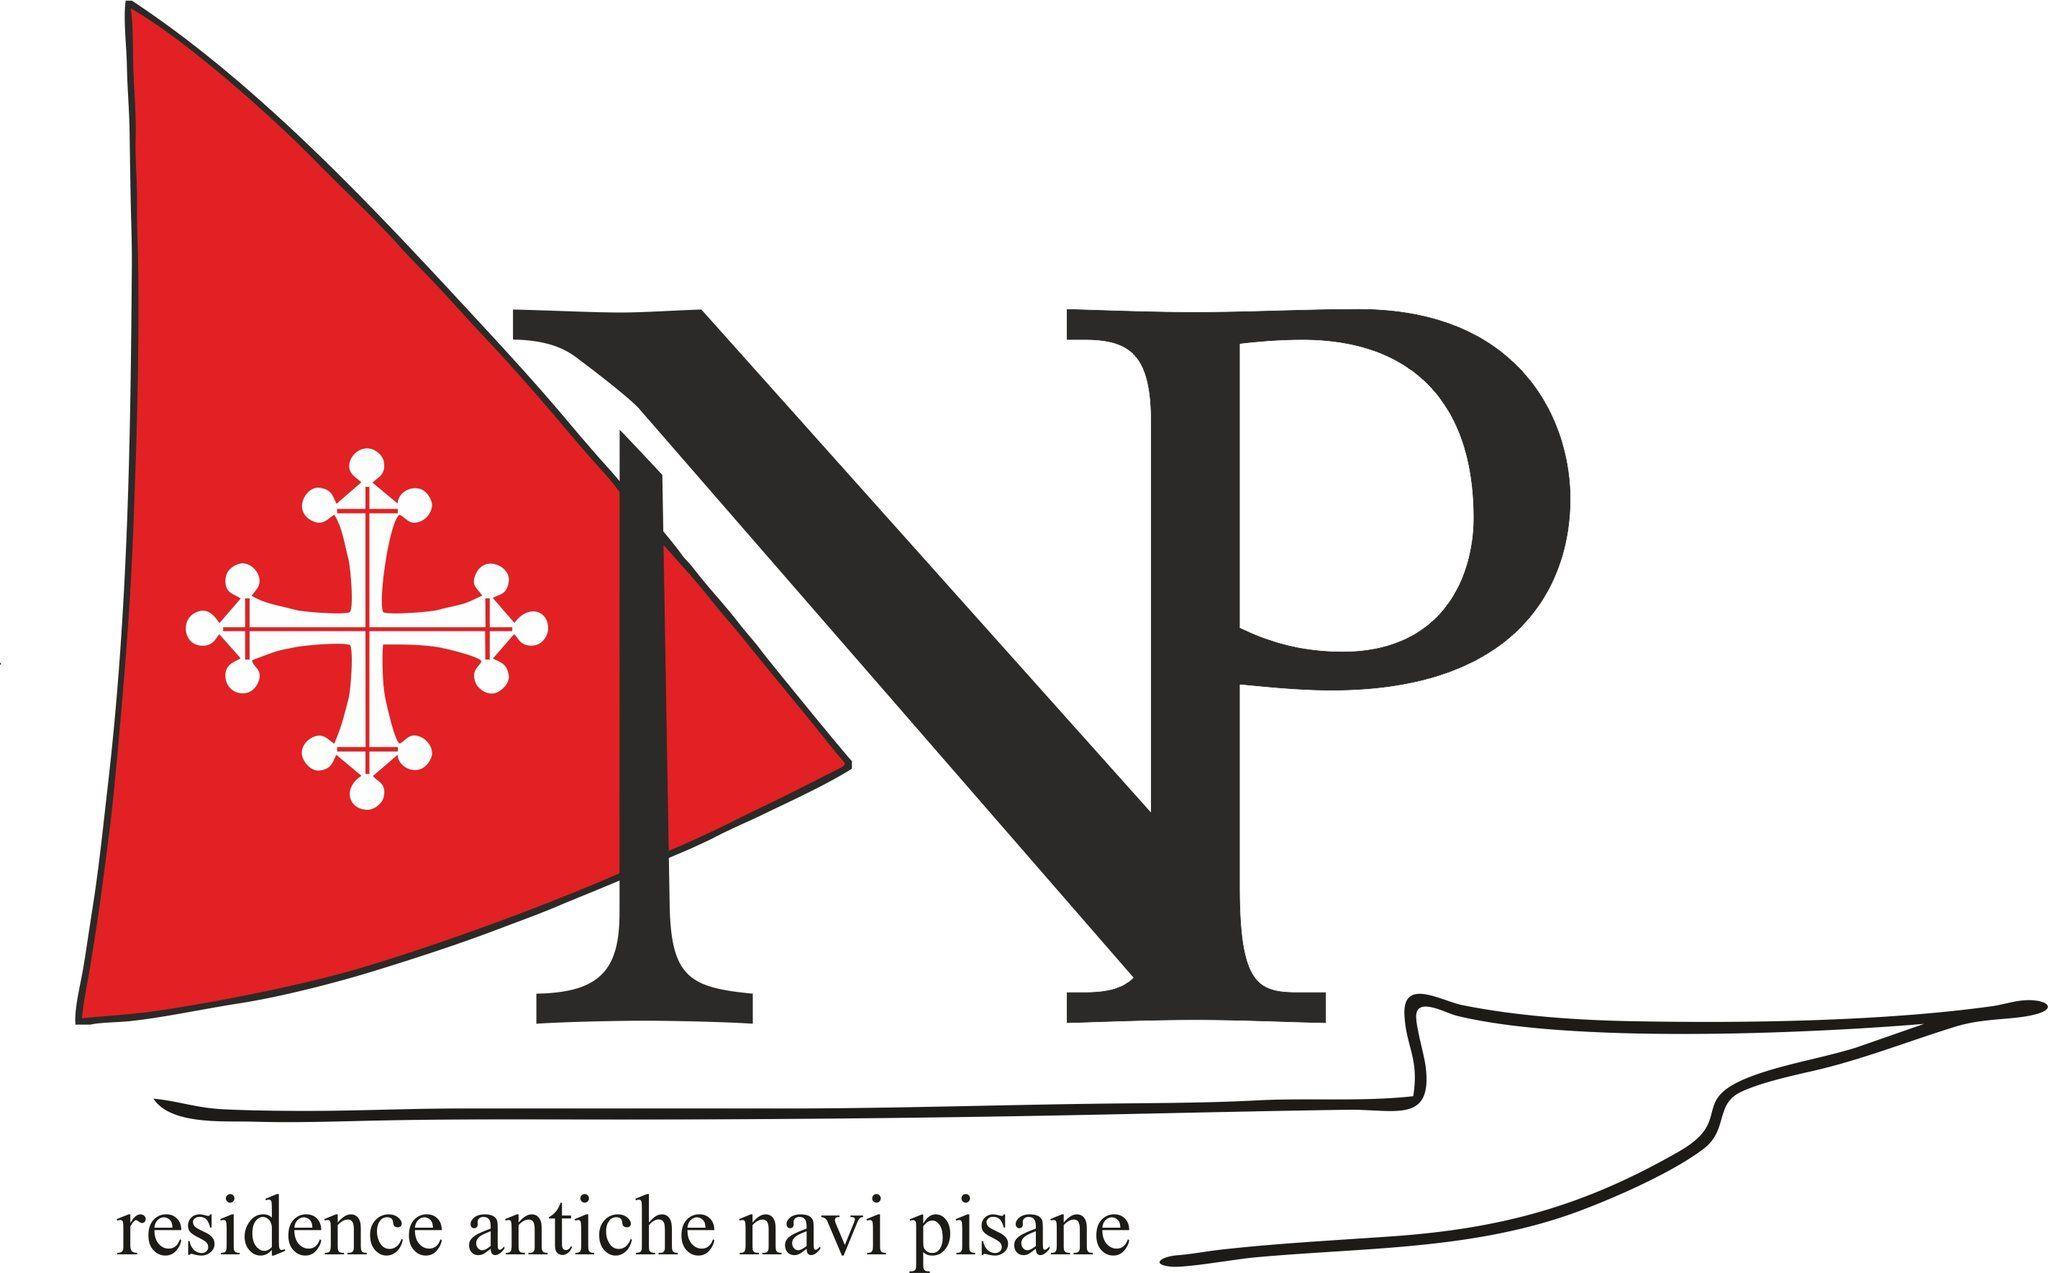 Antiche Navi Pisane